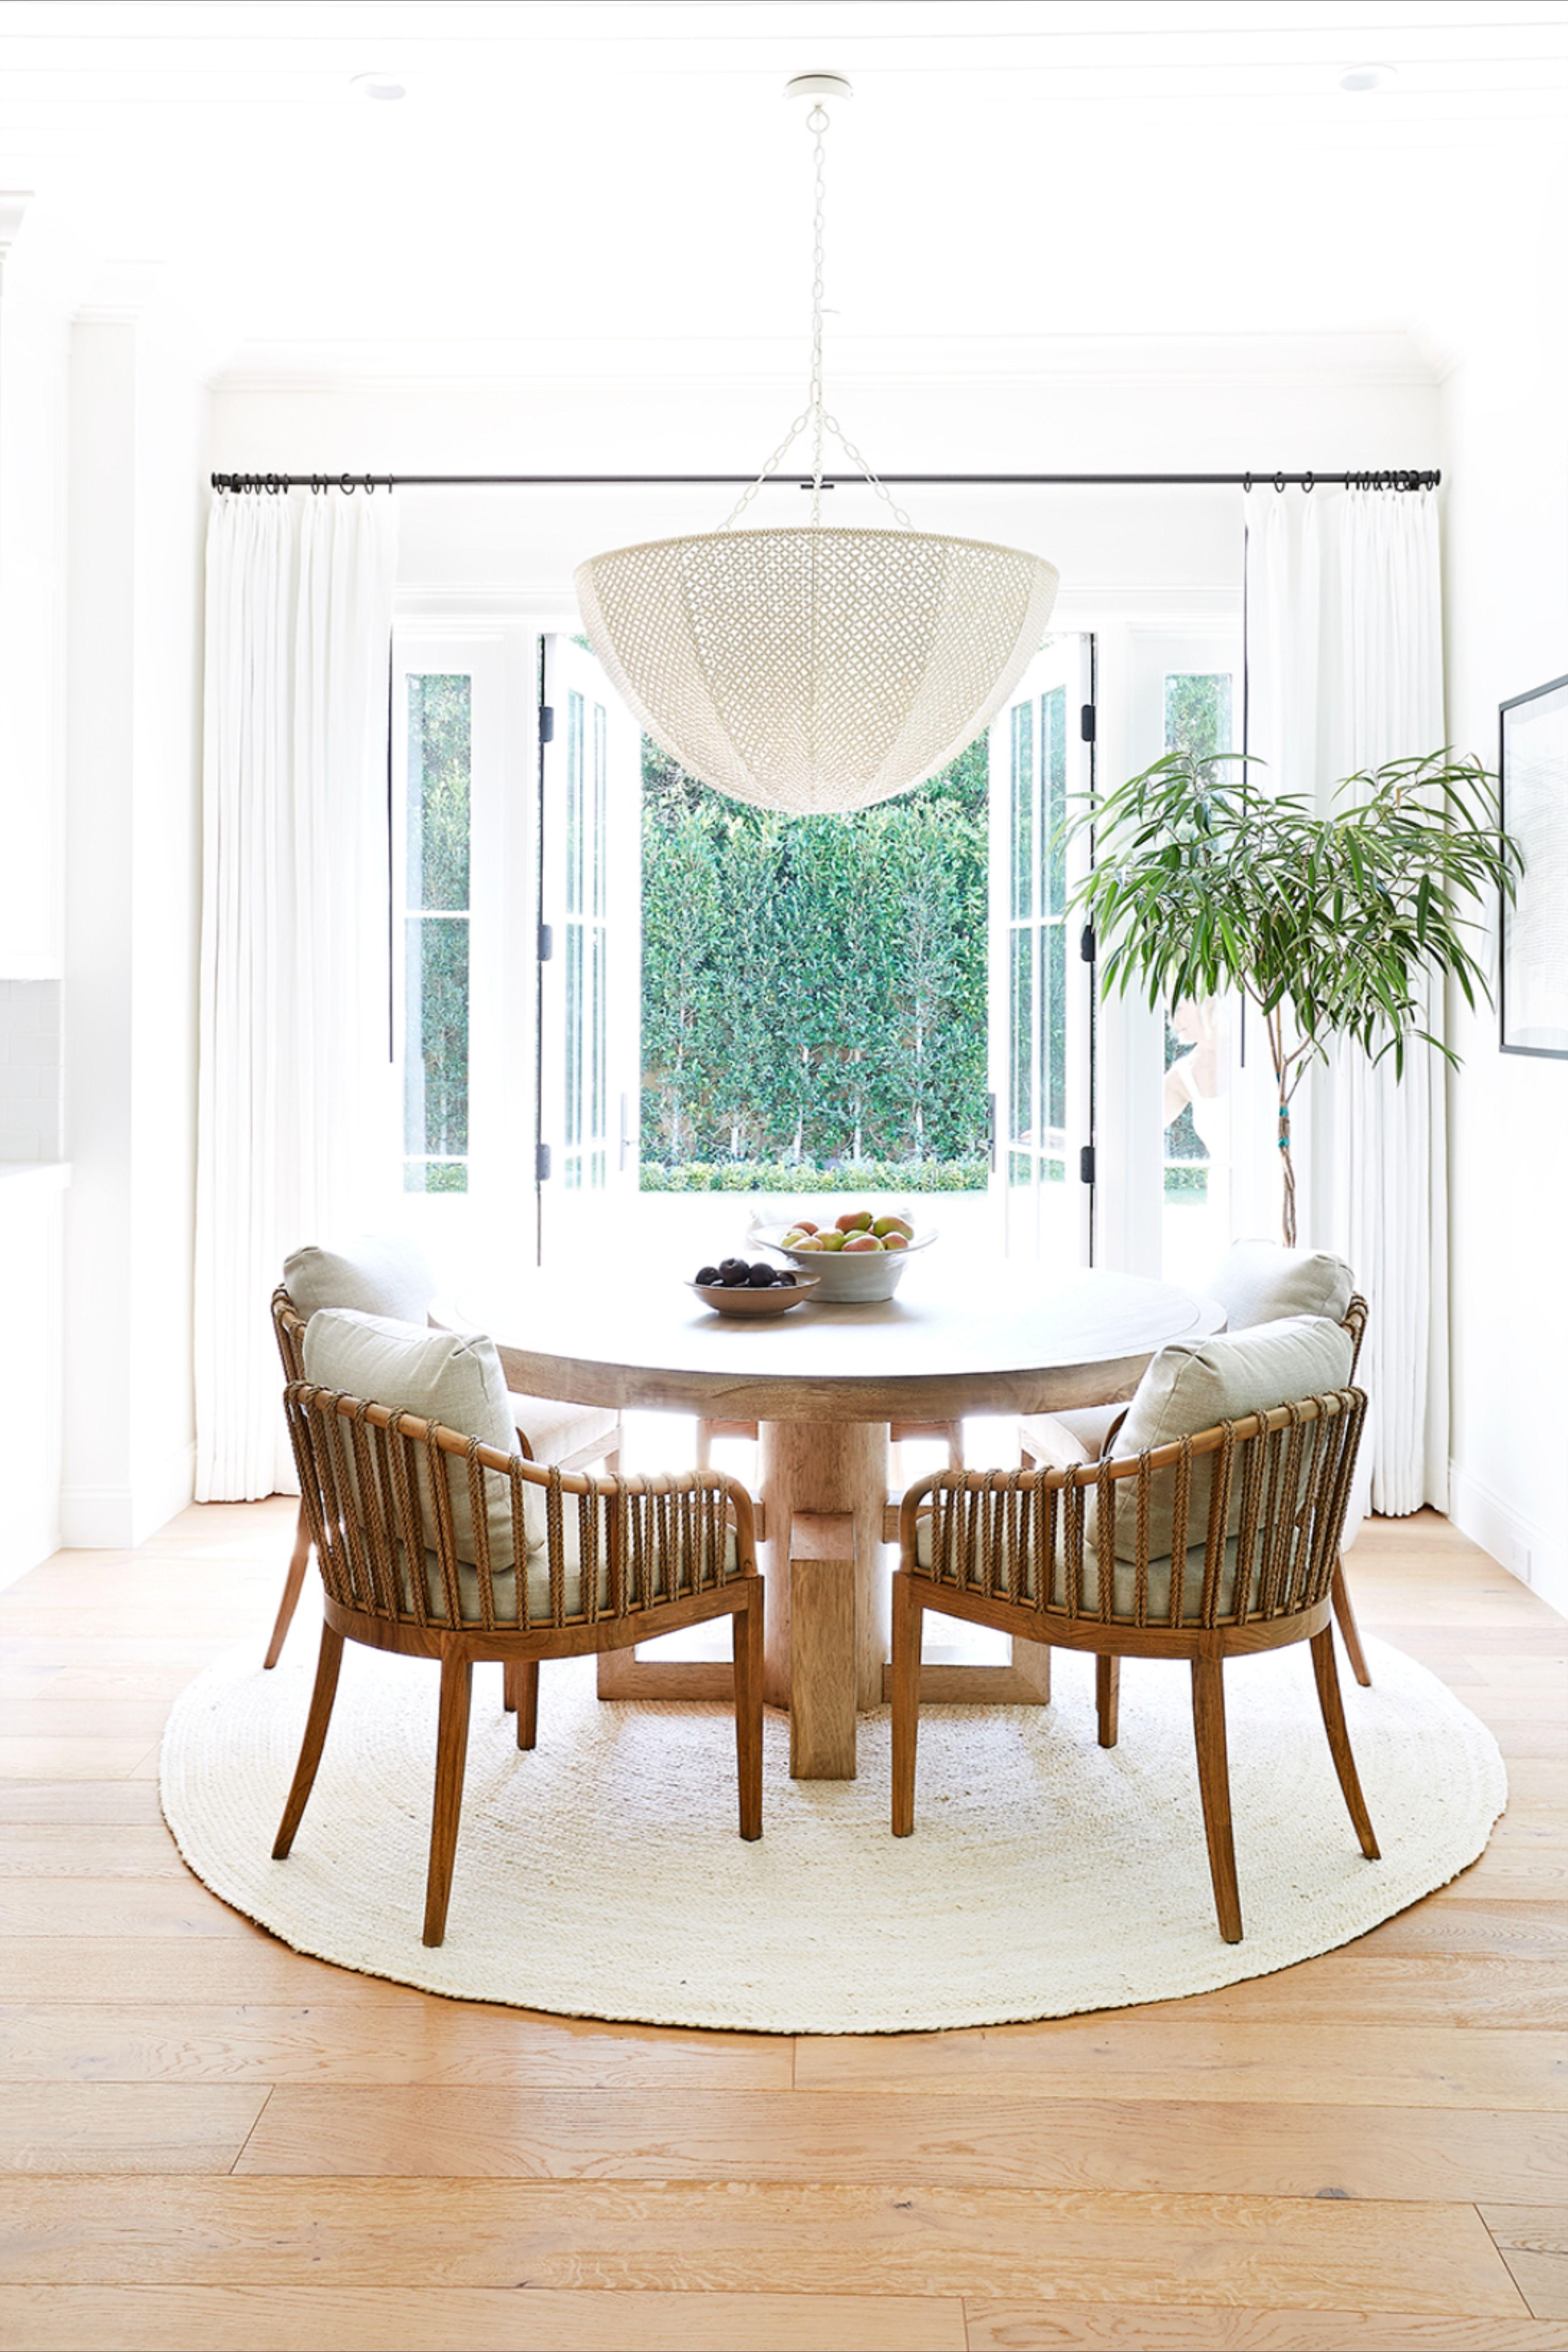 2019 fan favorite projects ideas casa casa fan favorite ideas projects oturma odasi tasarimlari ev icin ic mekan fikirleri